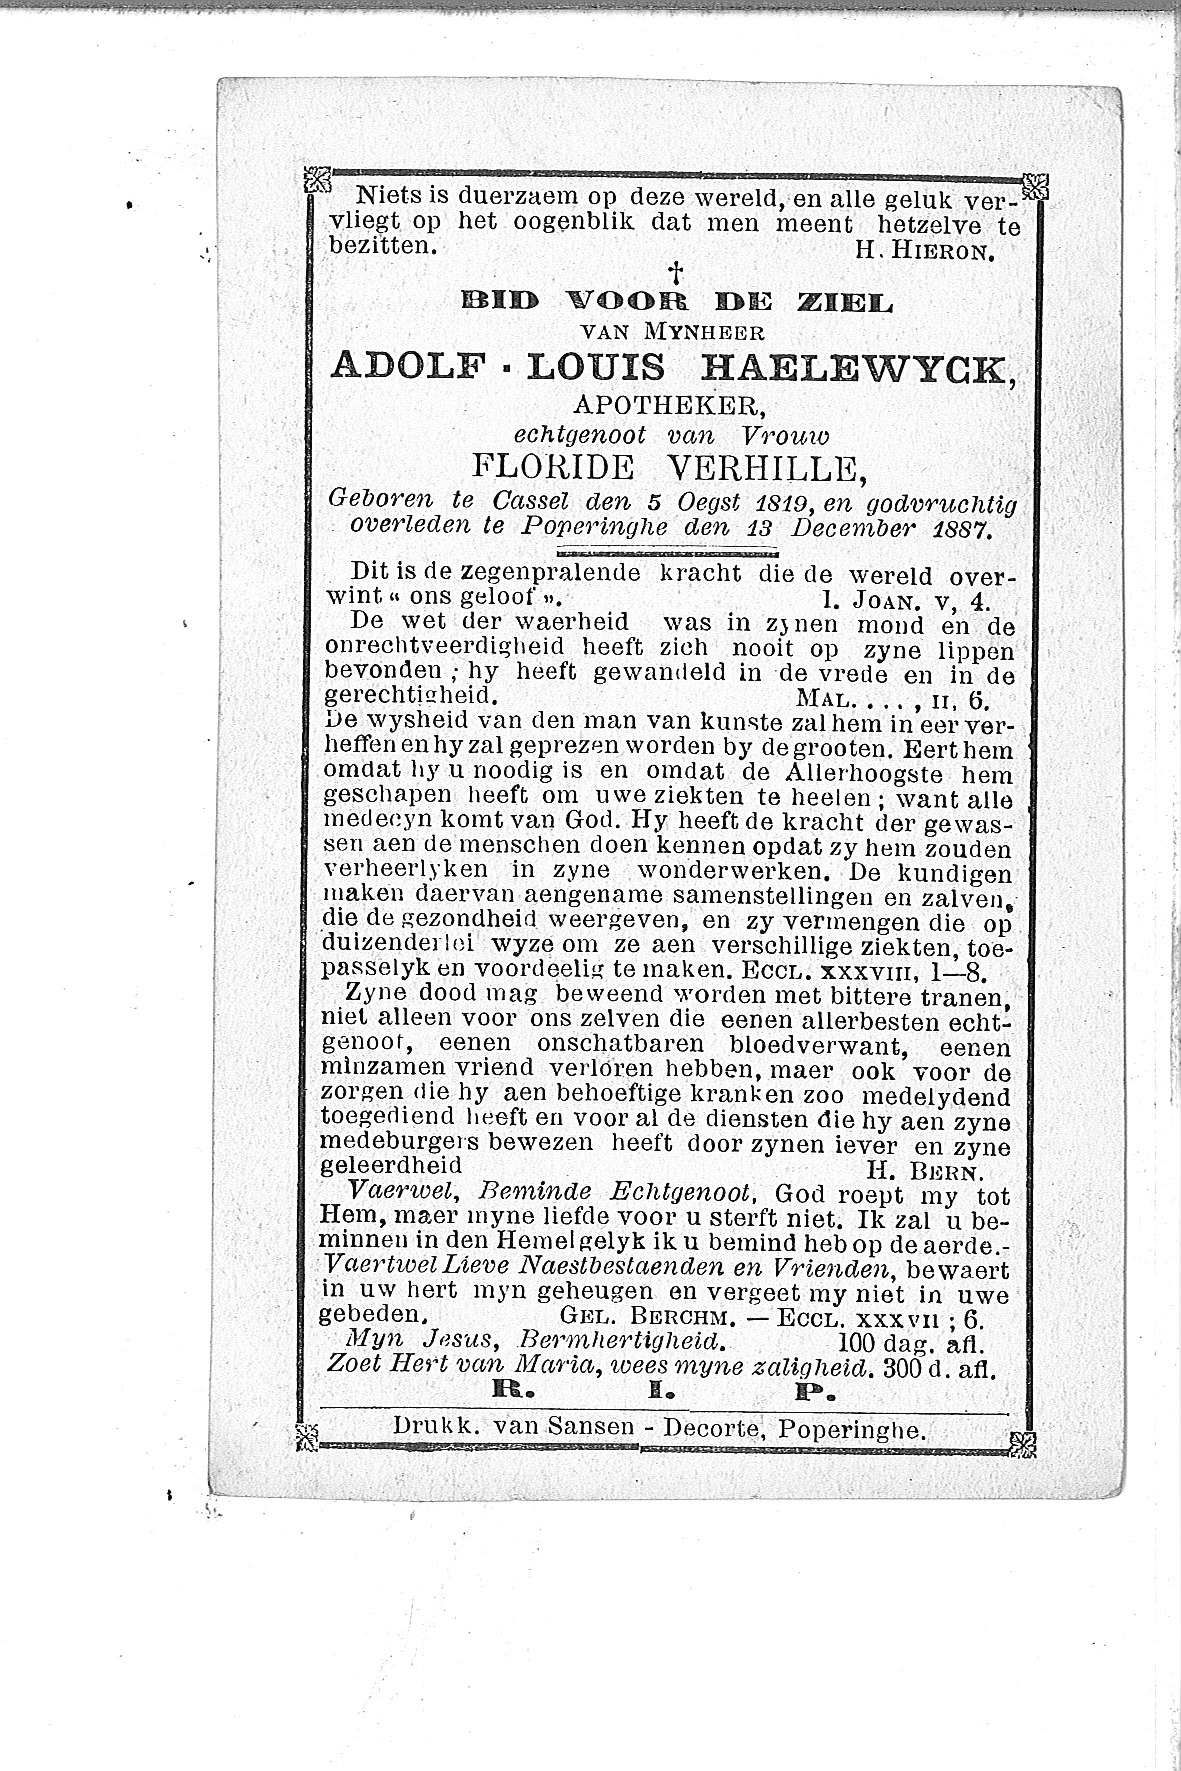 Adolf-Louis-(1887)-20121011095319_00003.jpg